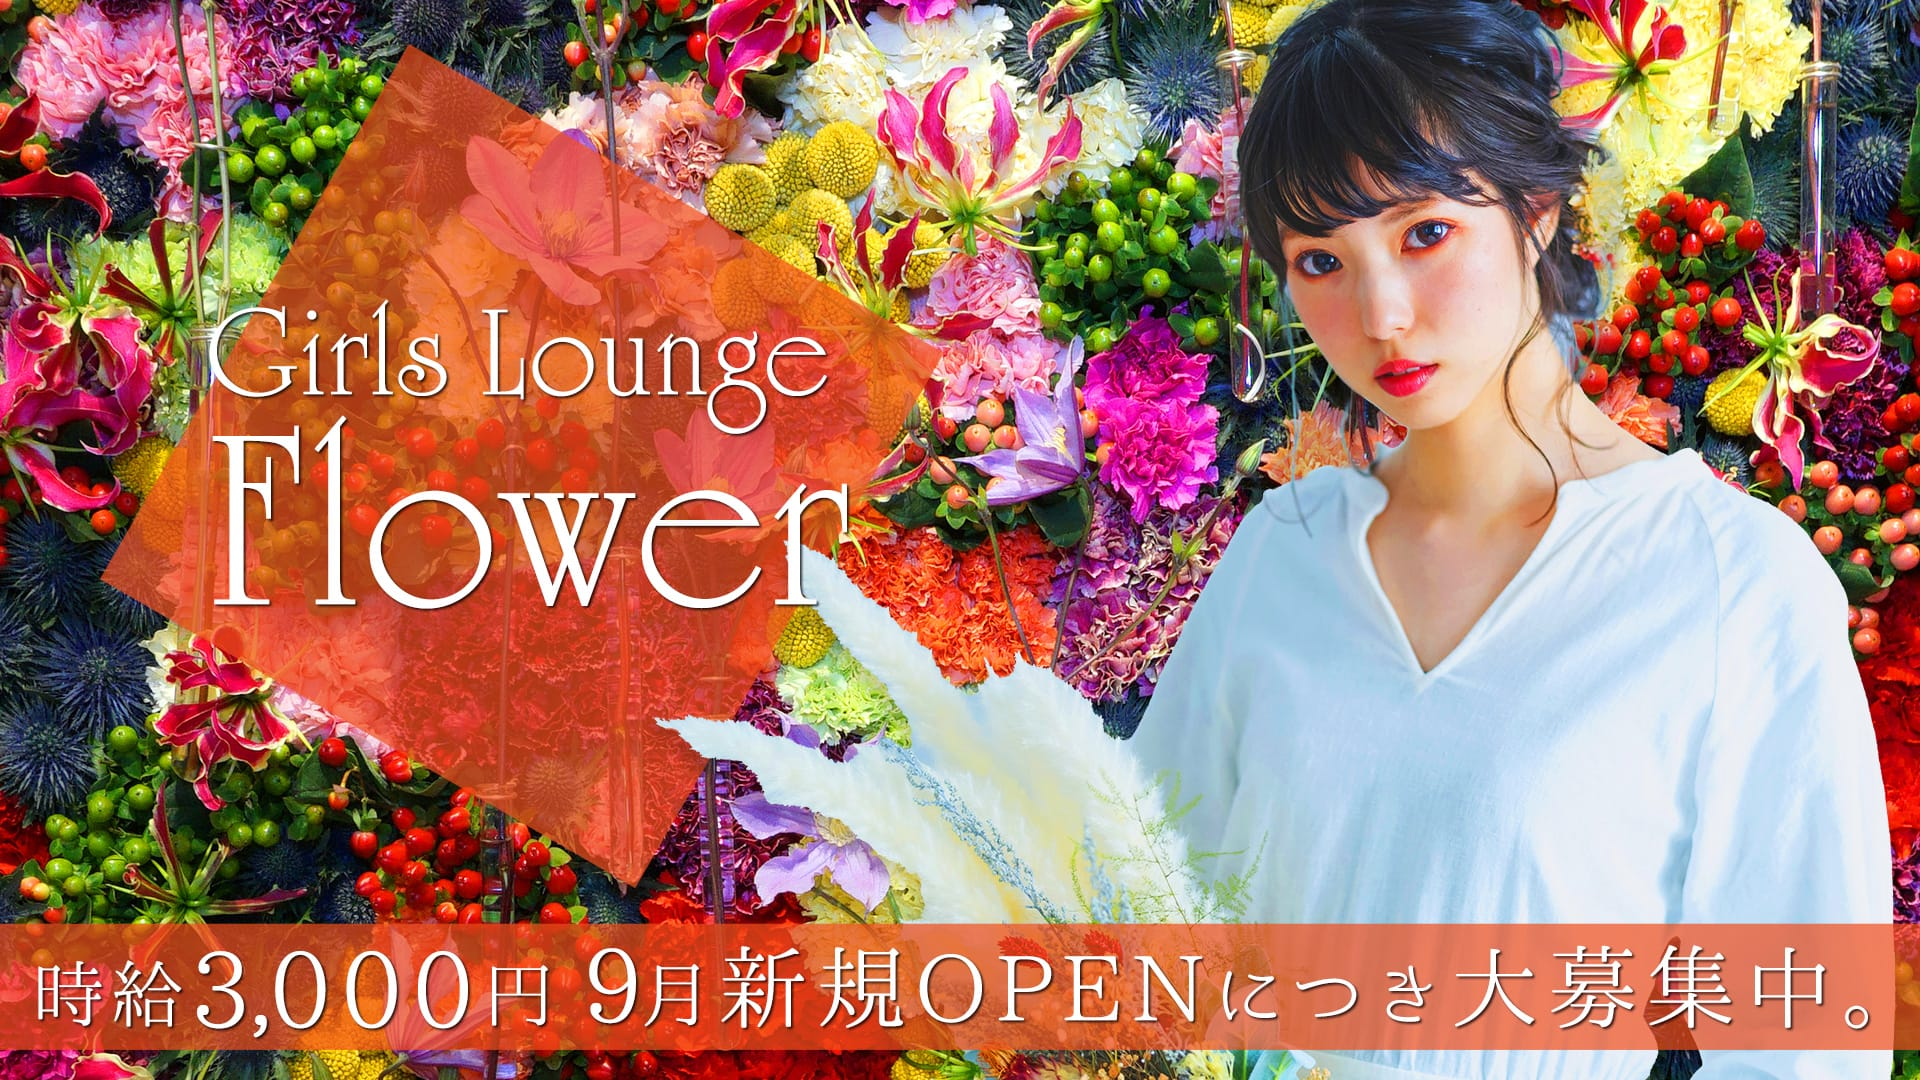 Girls Lounge Flower(フラワー) 錦糸町ガールズバー TOP画像